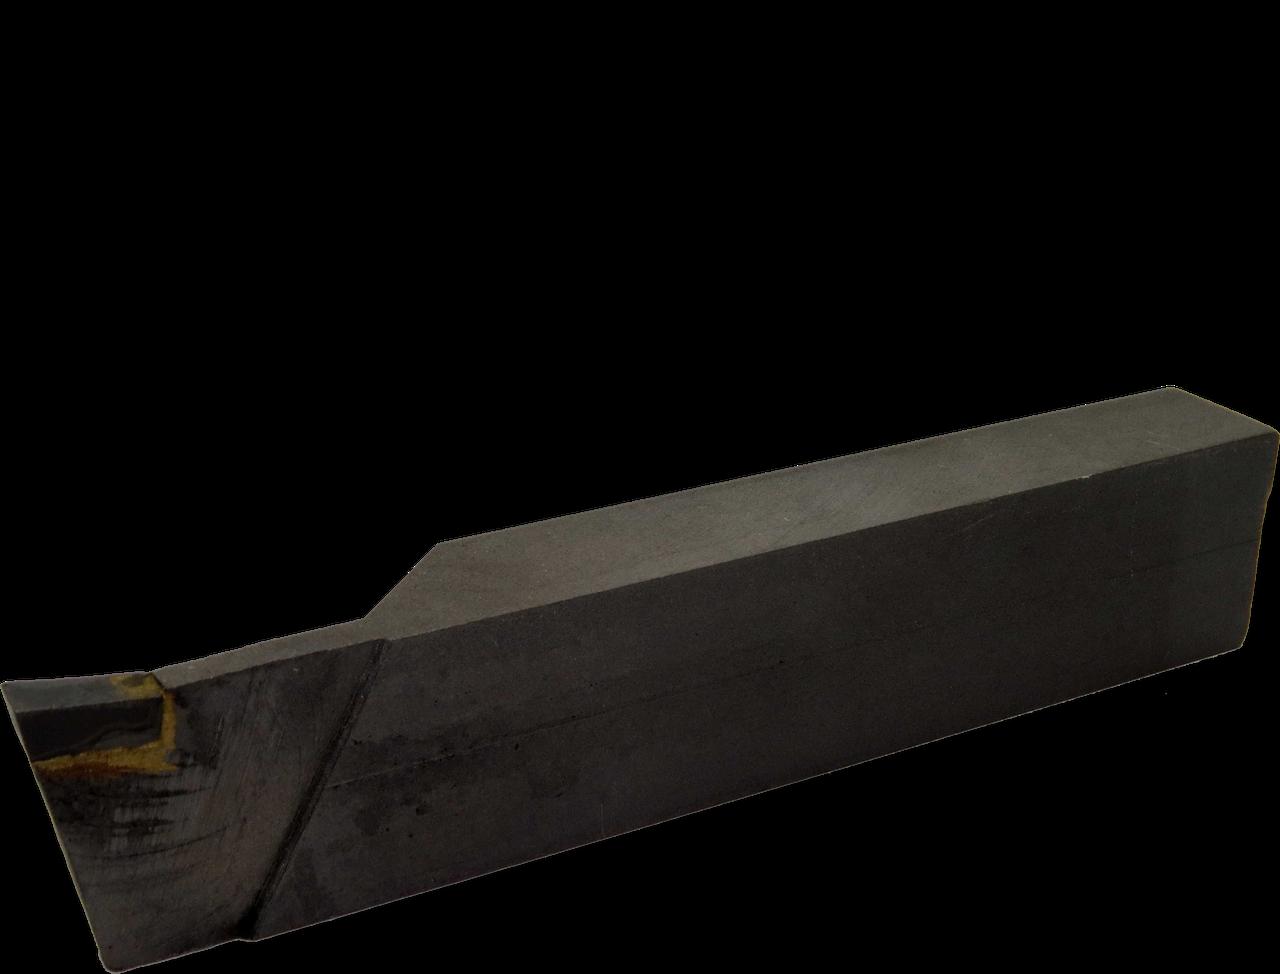 Резец 32х20х170 (Т15К6) отрезной токарный СИТО (Беларусь)